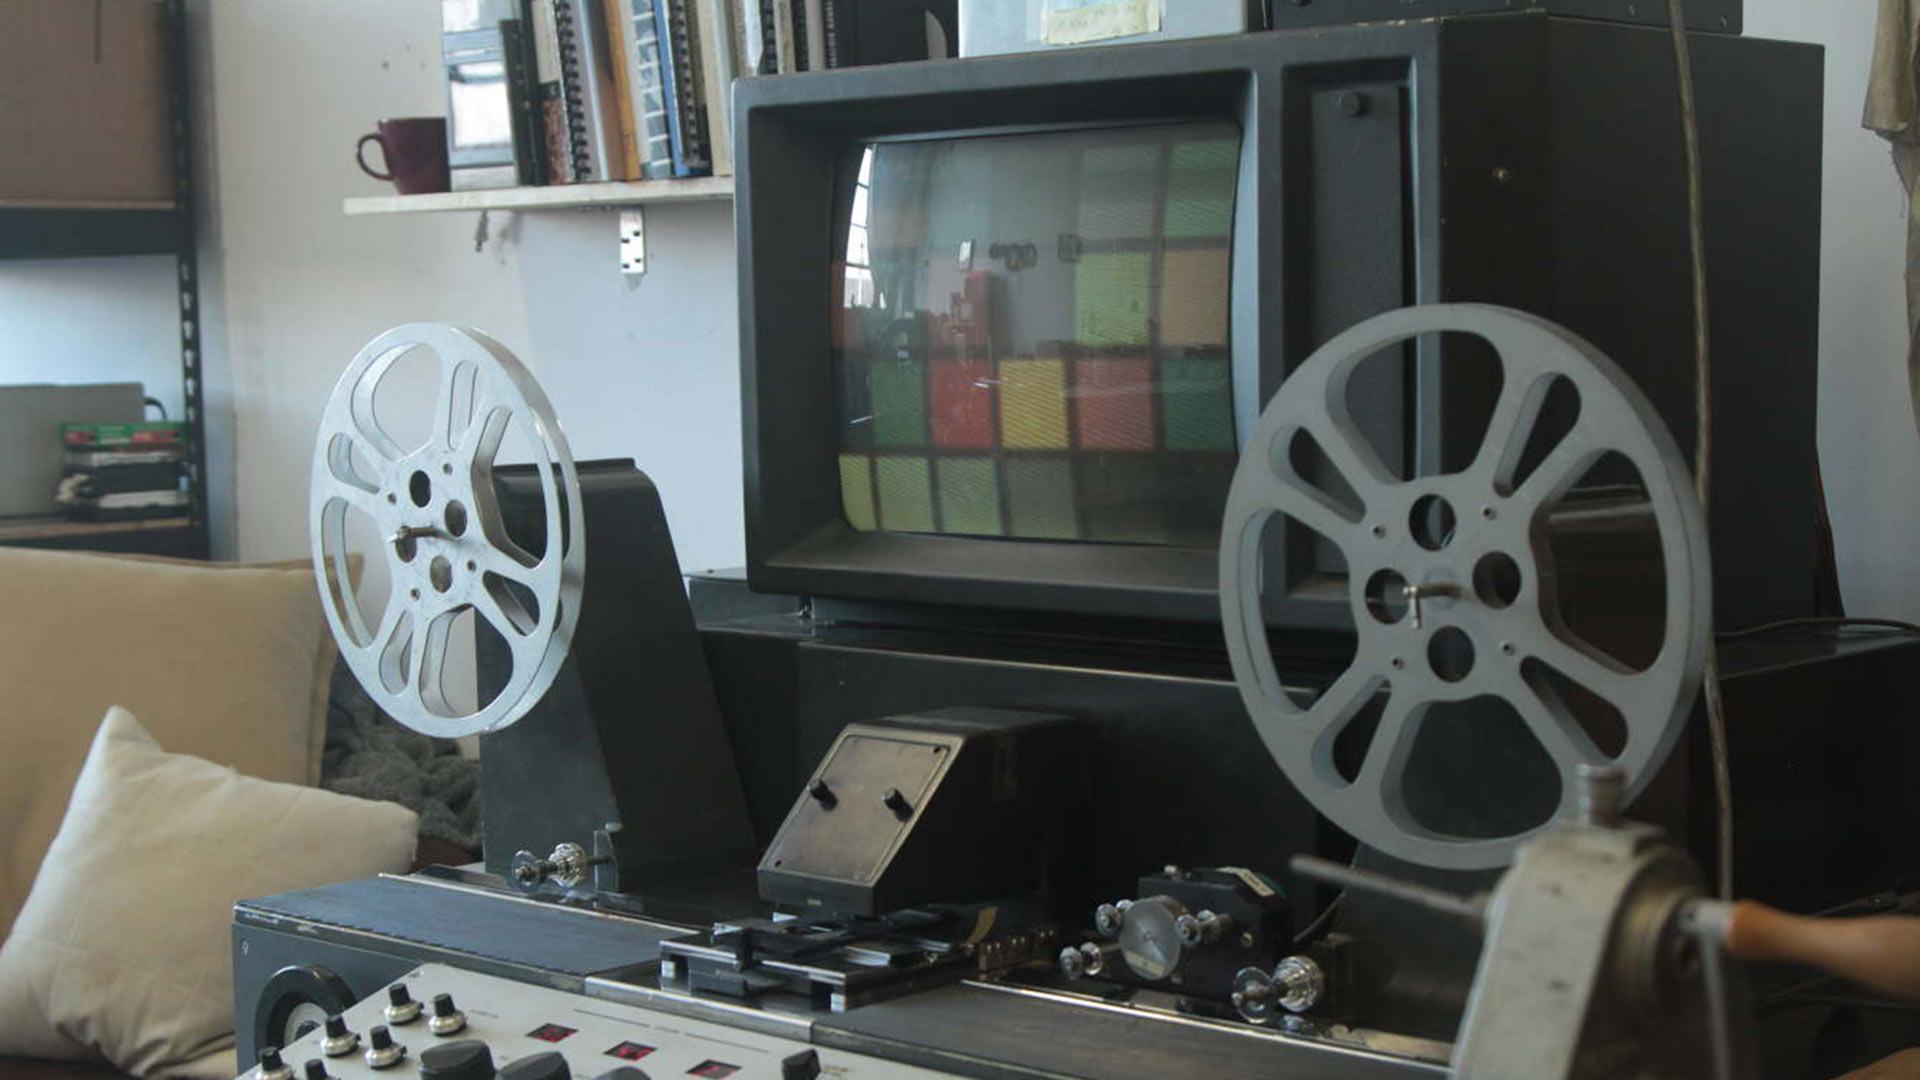 The Hazeltine Colour Analyser.